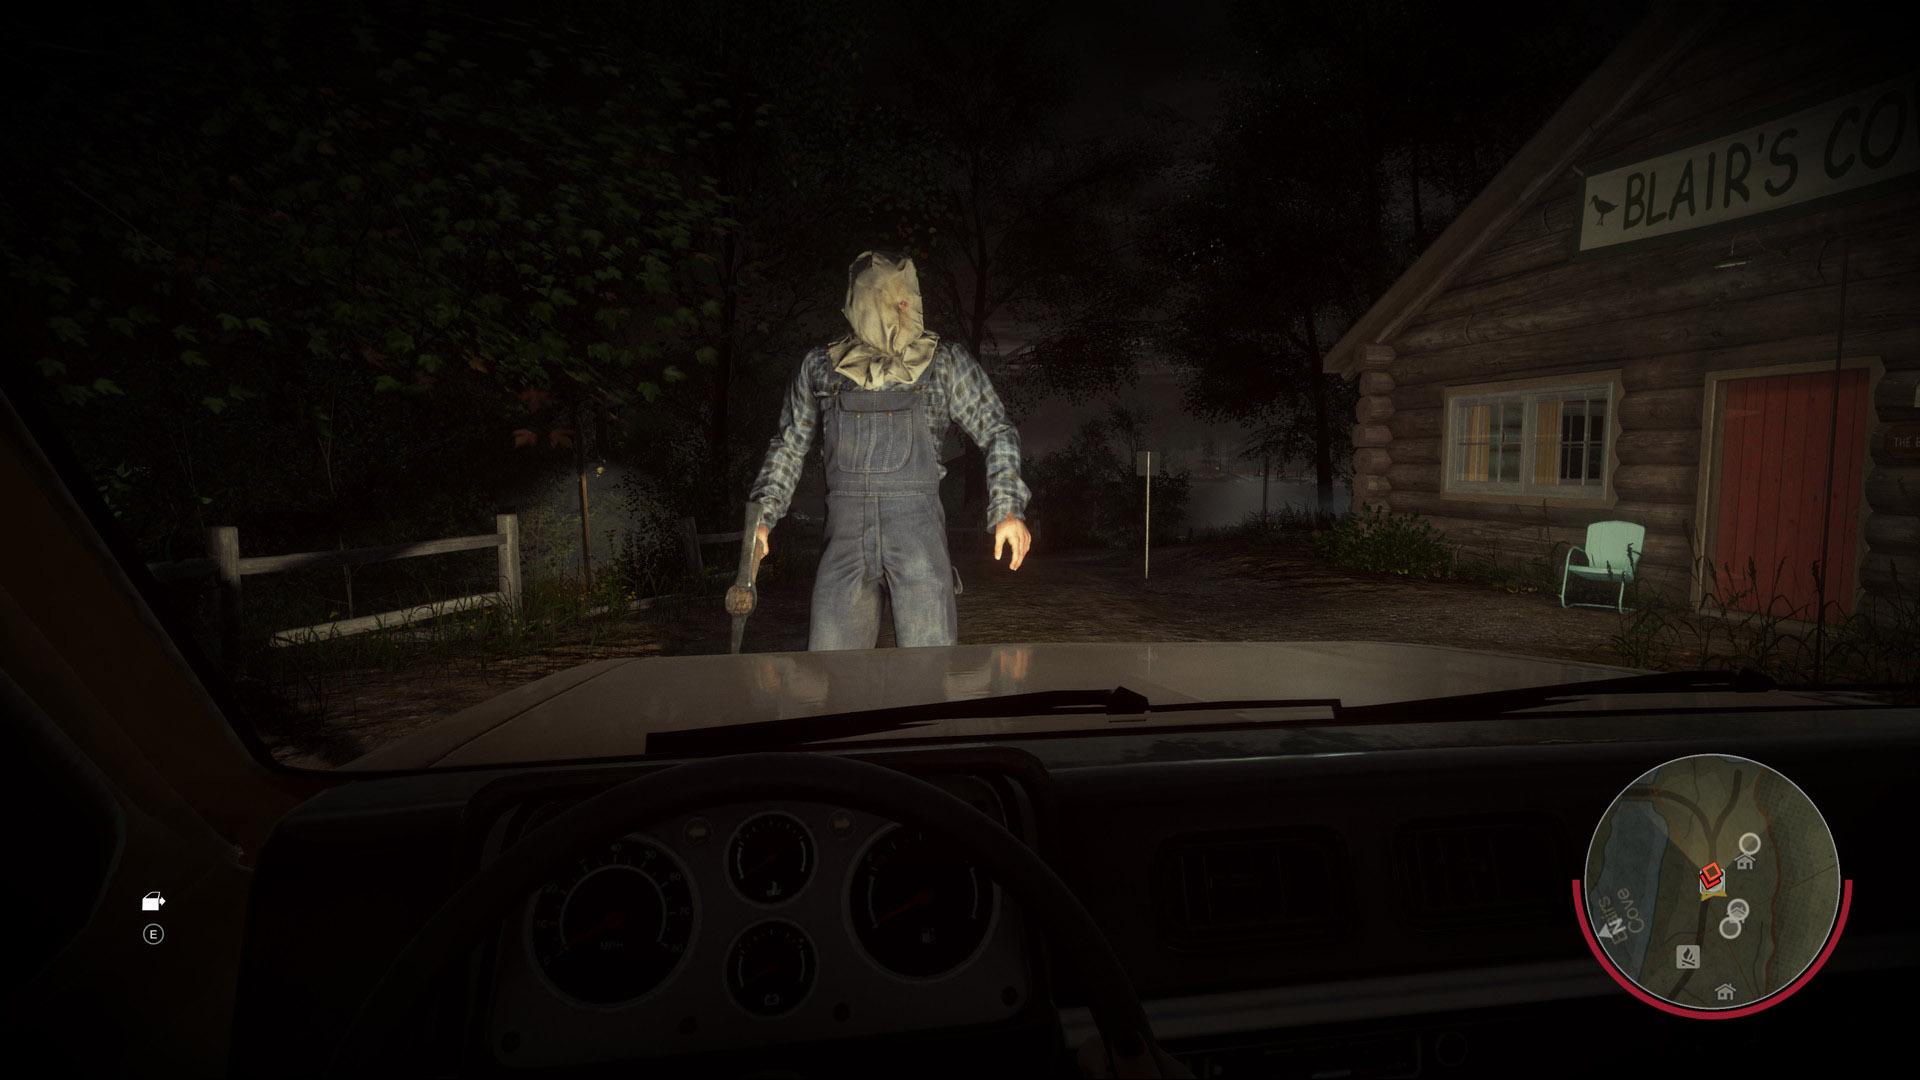 13号星期五:游戏版(Friday the 13th: The Game)插图1